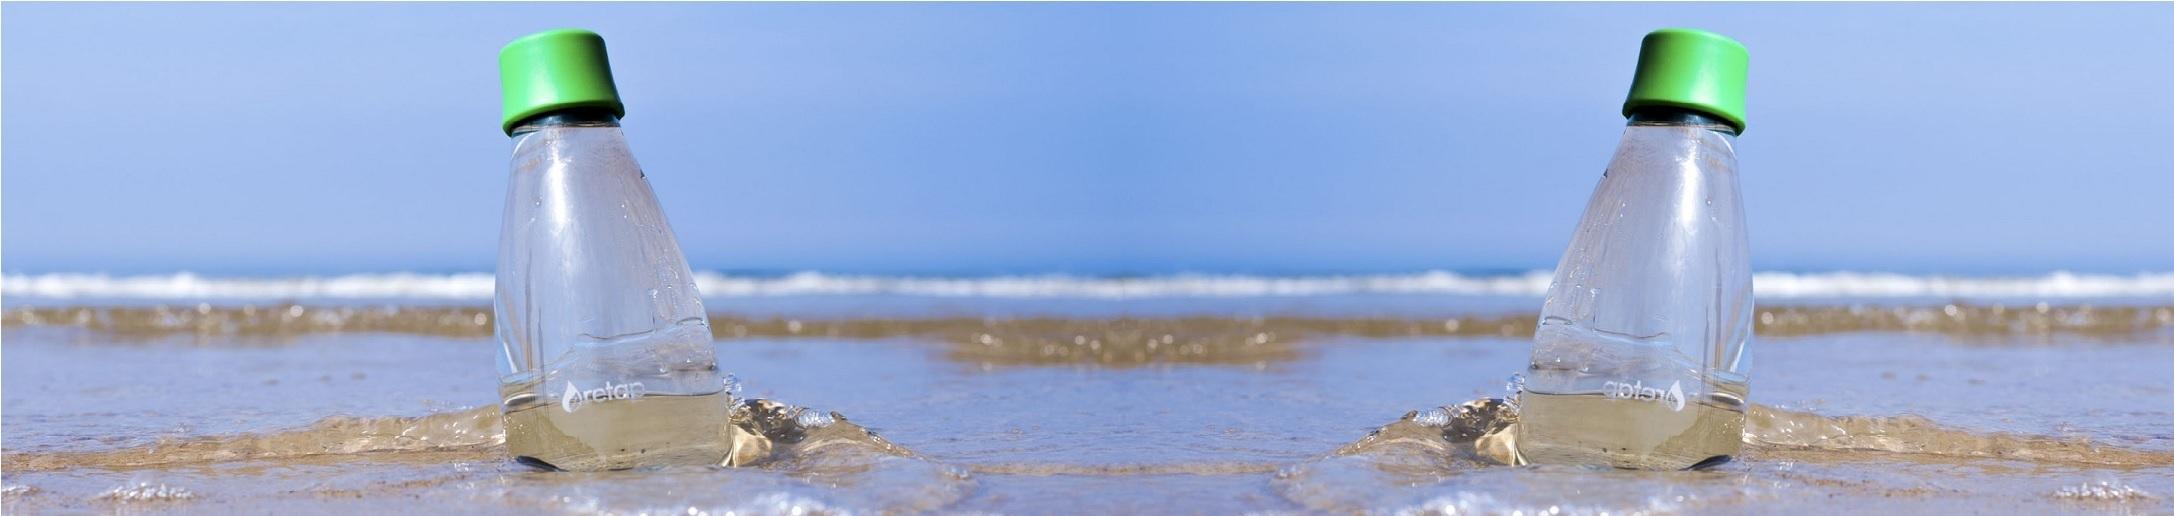 Retap at the beach